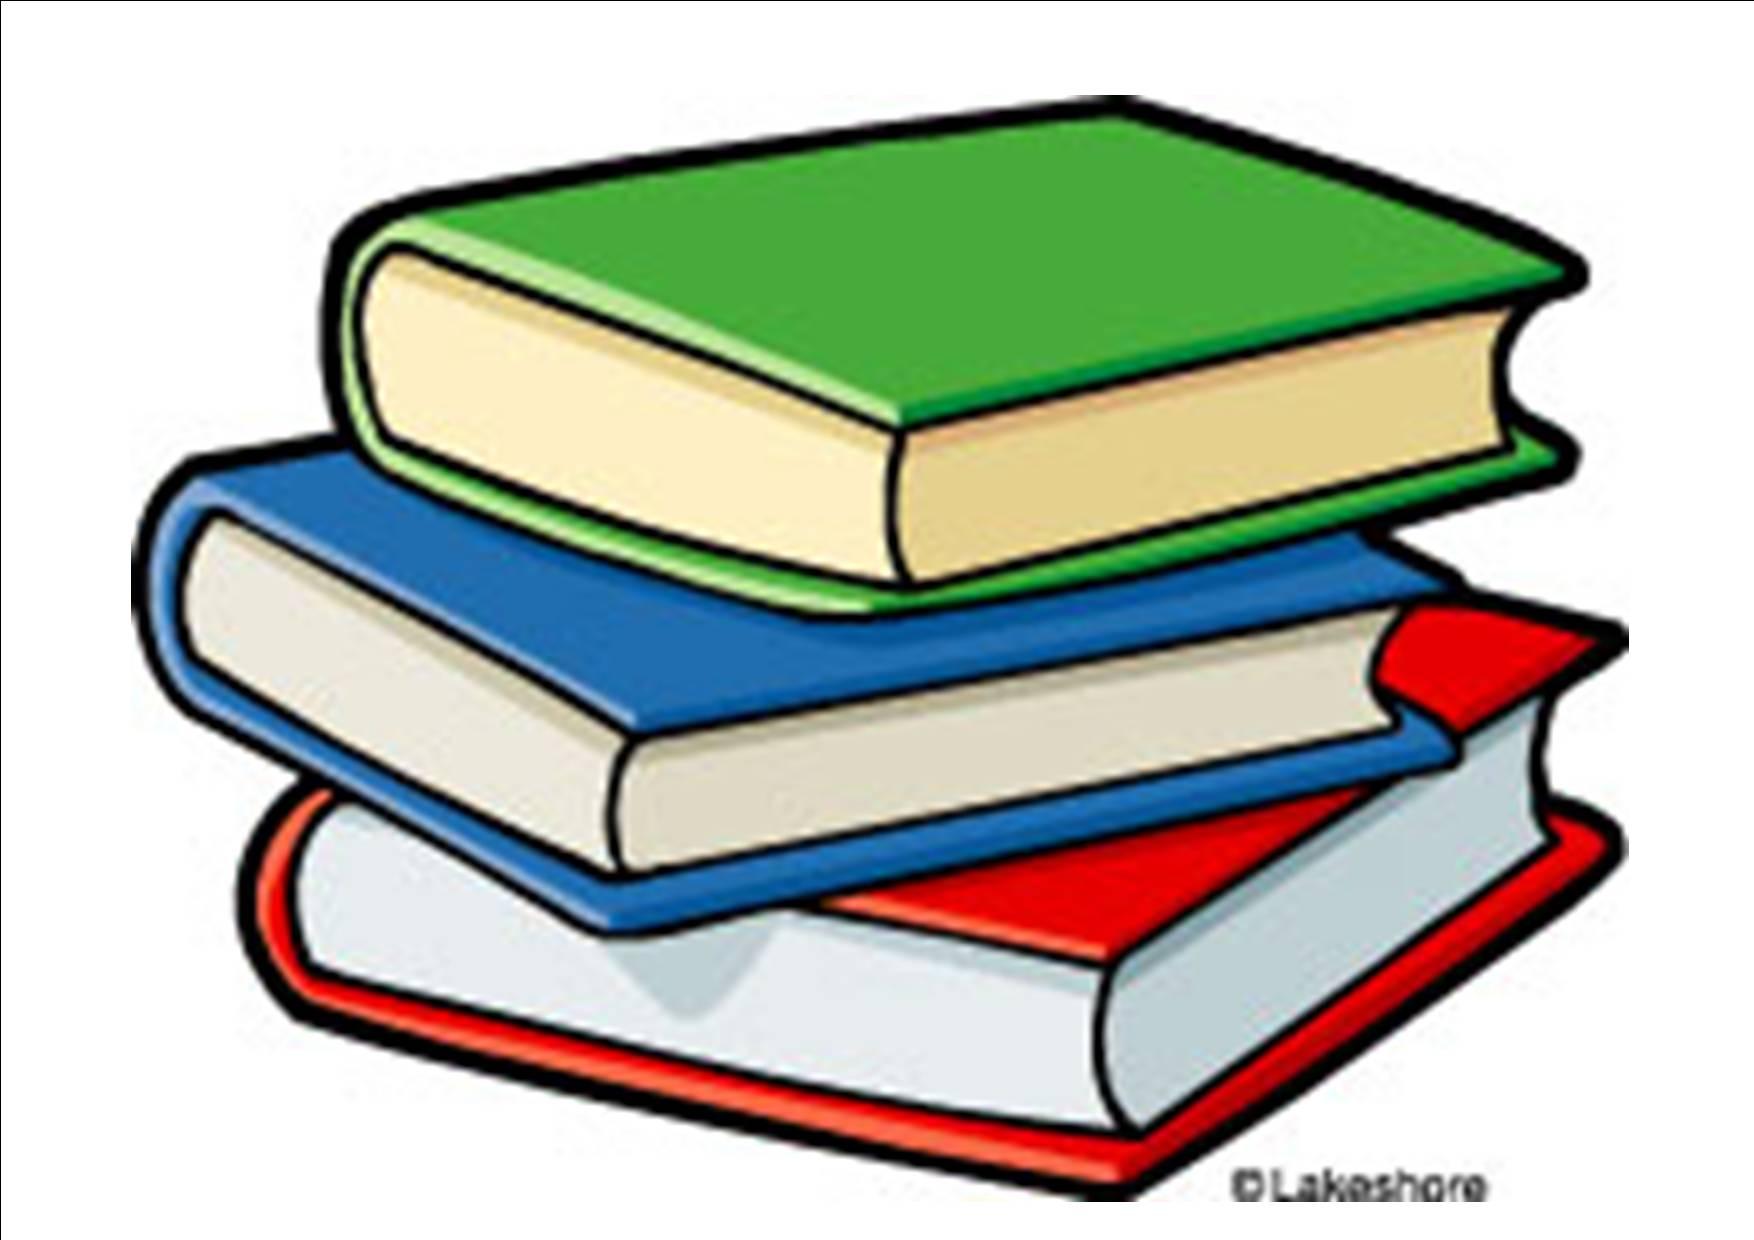 Book Clip Art: 10 Reading Book Clipart.-Book Clip Art: 10 reading book clipart.-4